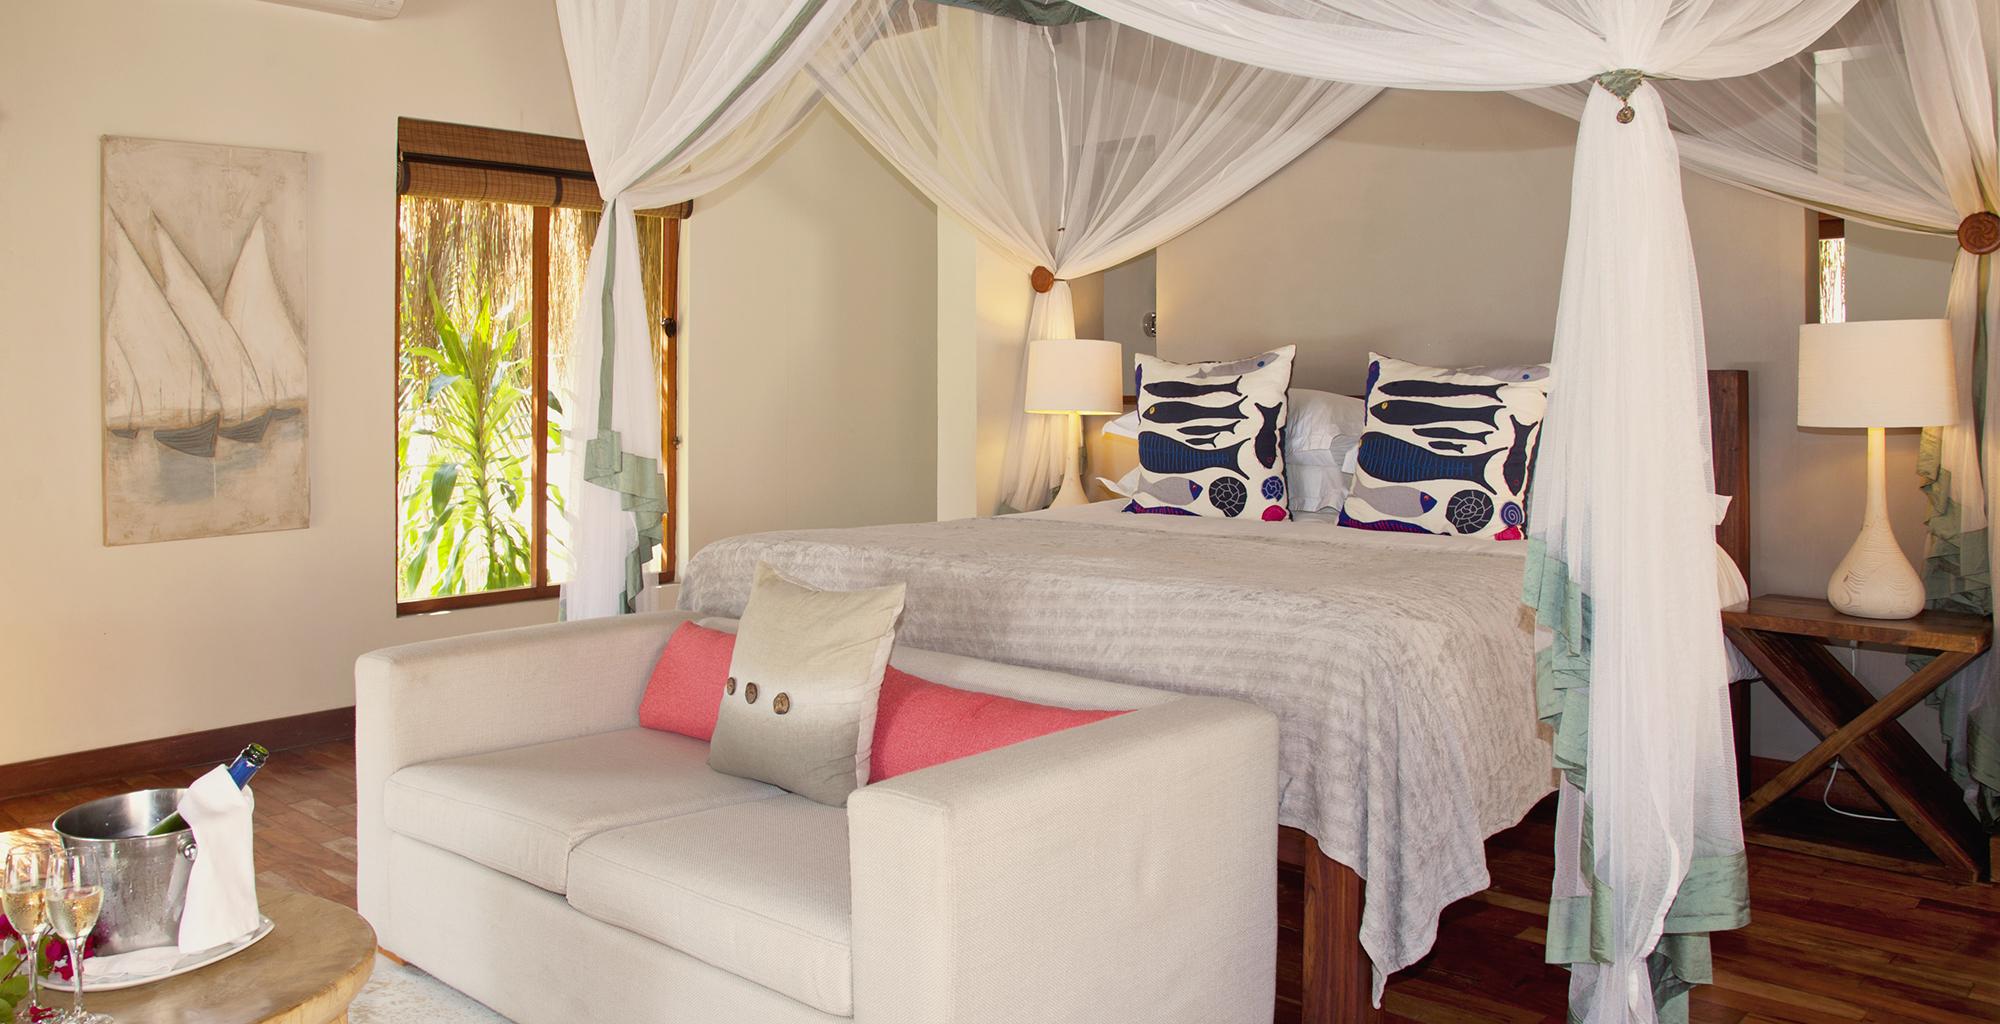 Mozambique-Bazaruto-Archipelago-Azura-Benguerra-Bedroom